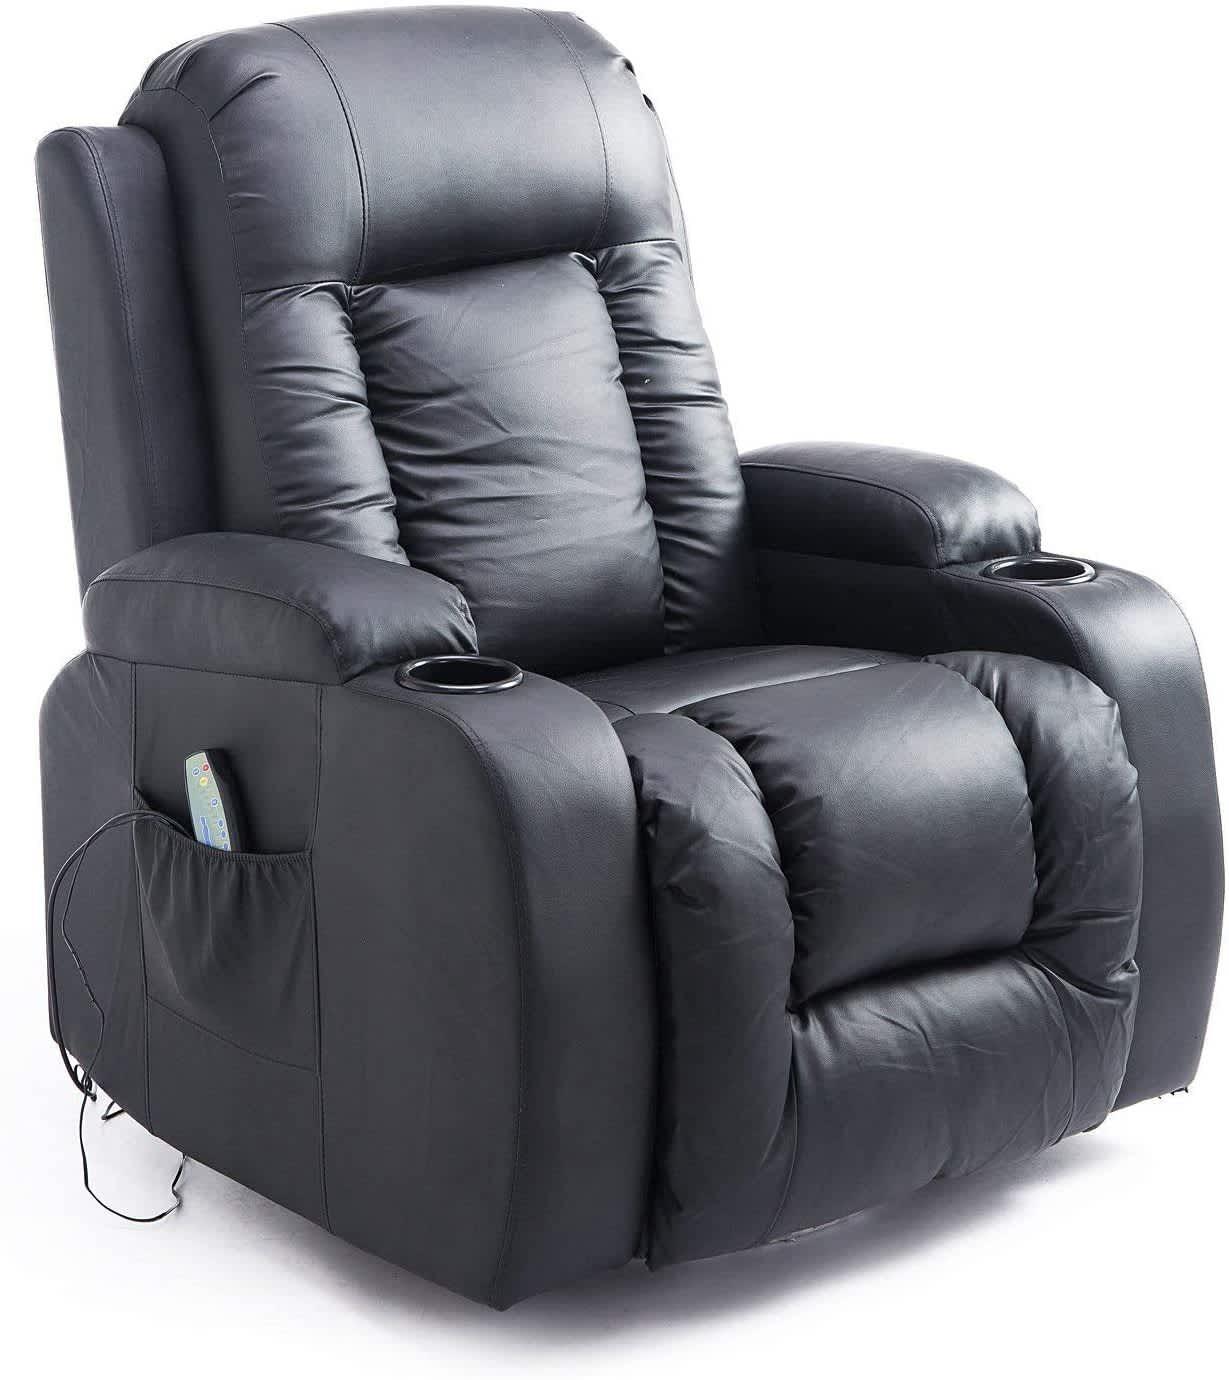 HomCom Reclining Massage Chair